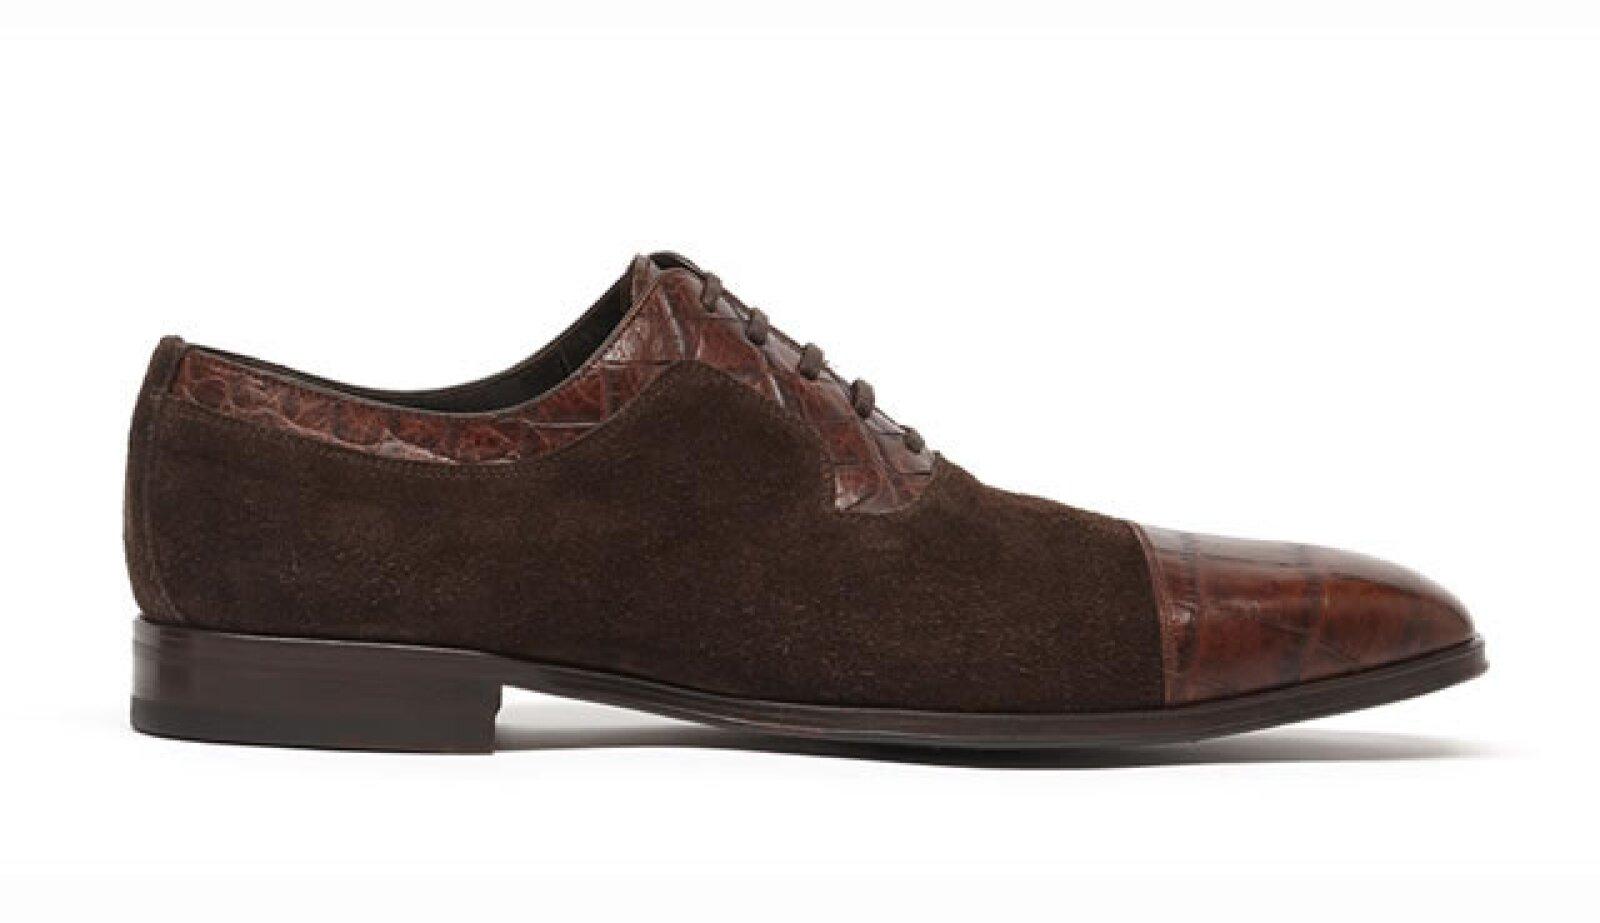 Zapatos Inglés de Prada Mx. $6,390 pesos. Boutique CC Santa Fe.